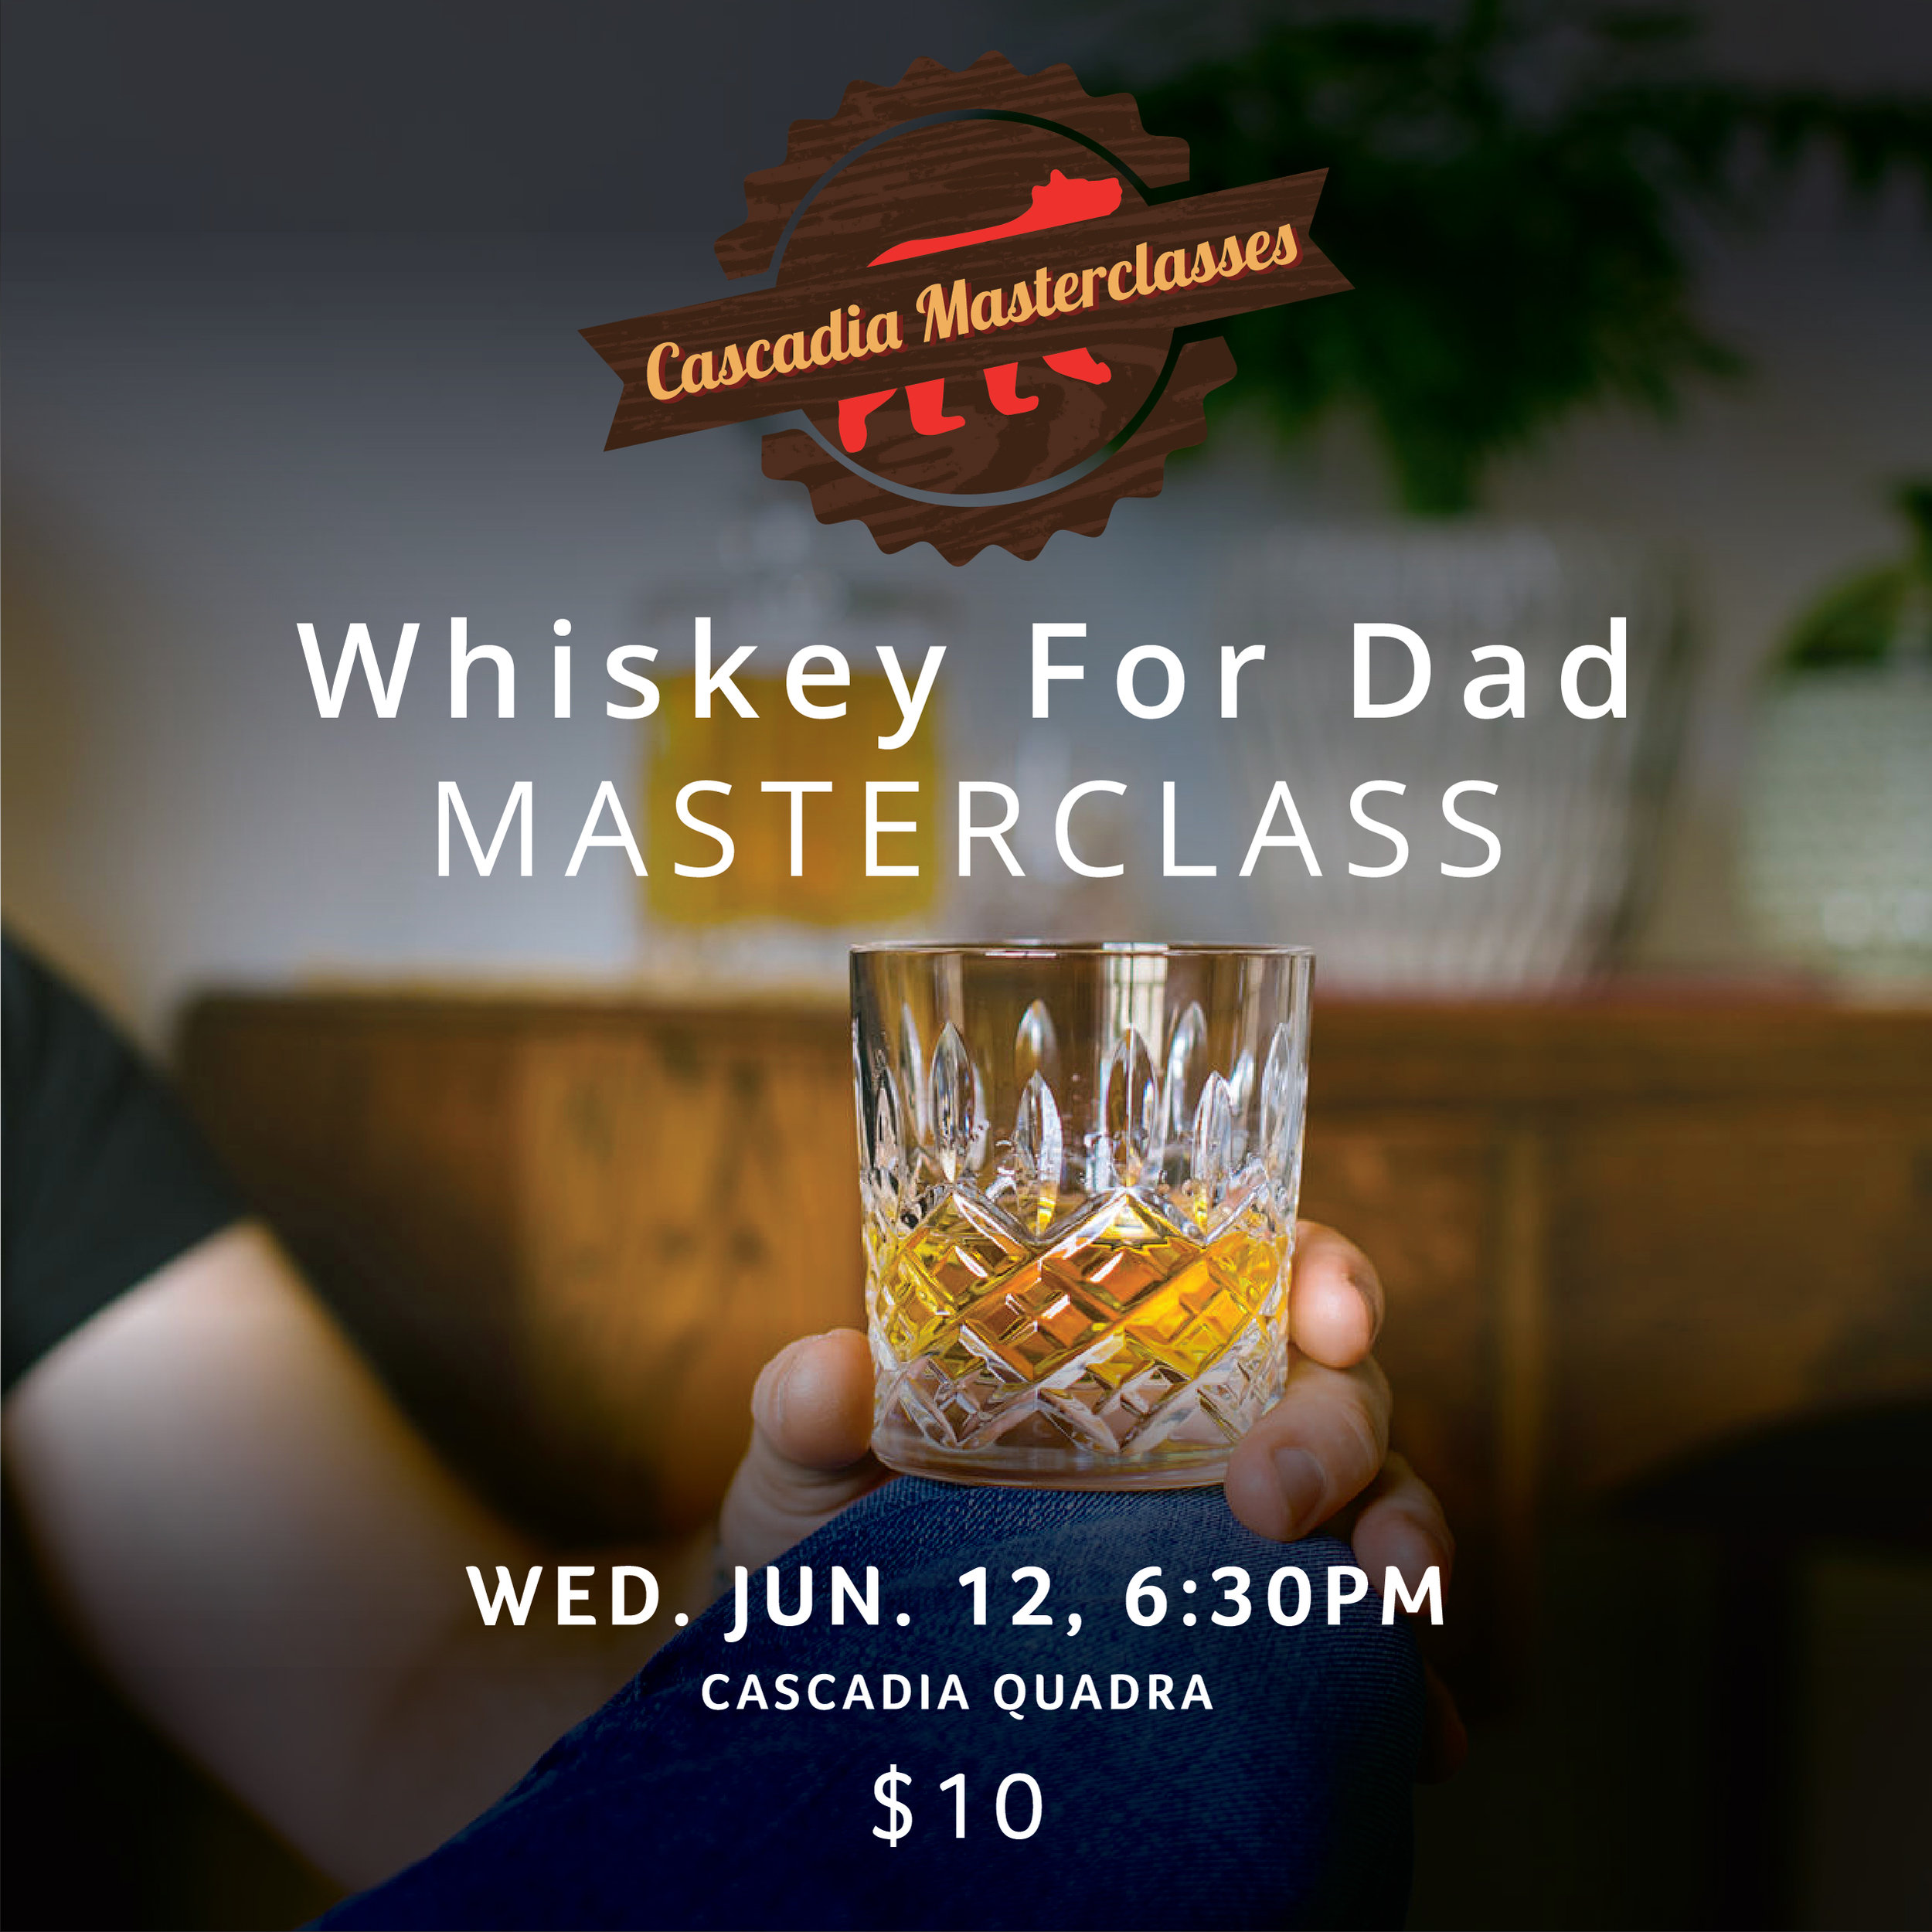 Cascadia Quadra Masterclass_WhiskeyForDad_June 2019_Web.jpg